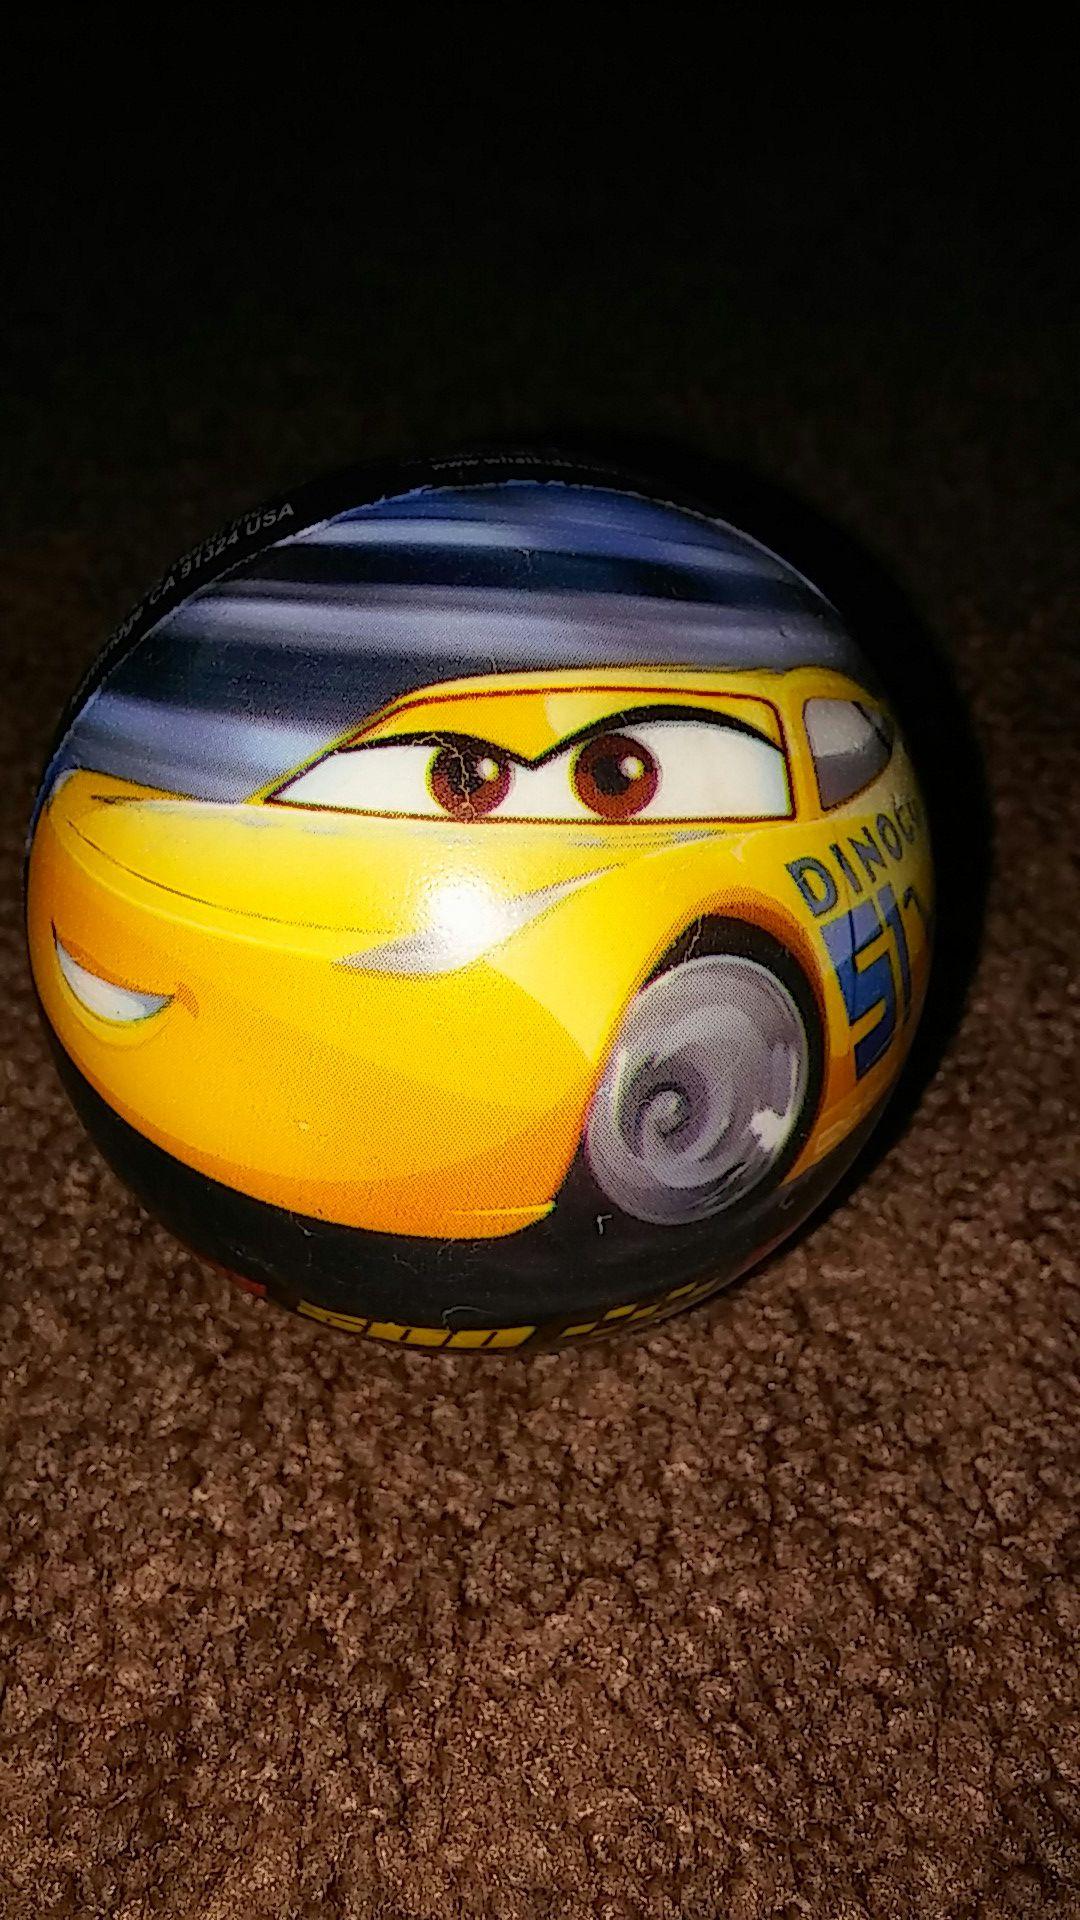 Disney Pixar Cars Cruz Ramirez ball